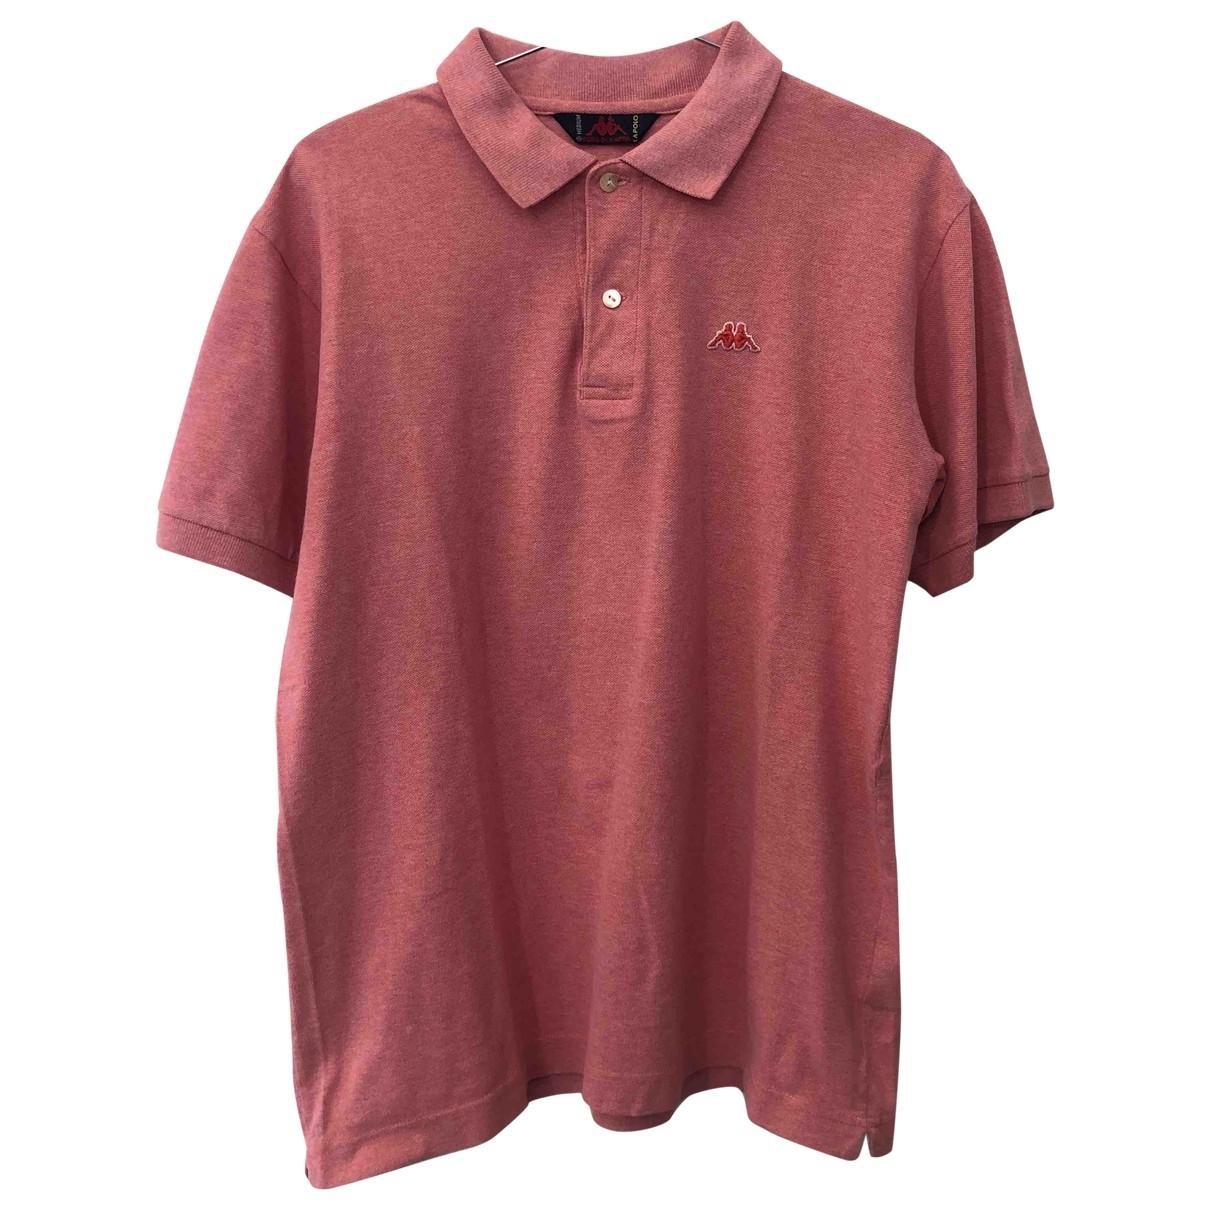 Kappa \N Pink Cotton Polo shirts for Men M International